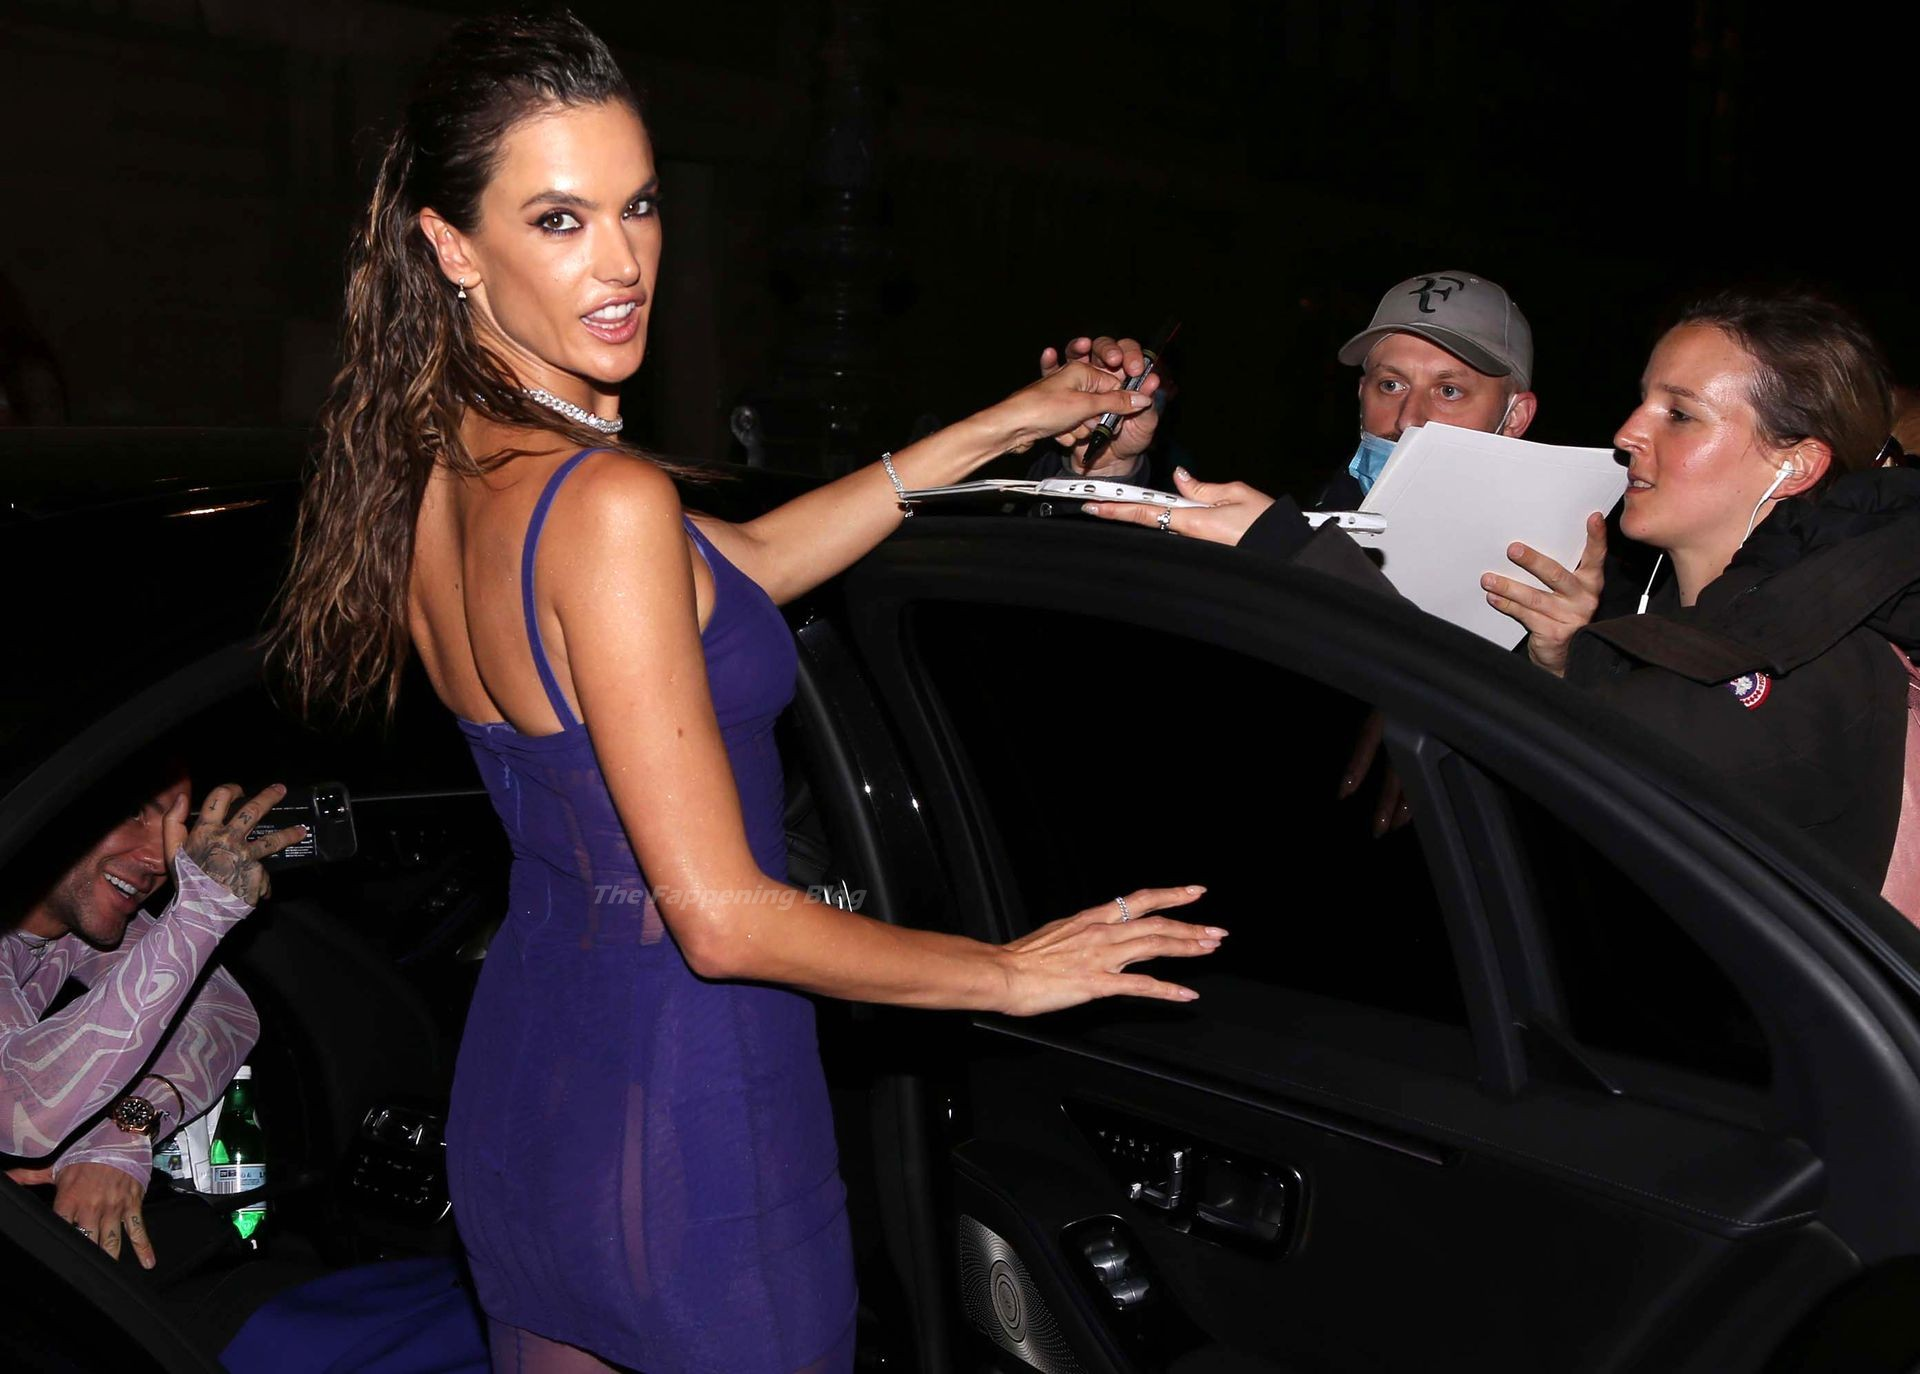 Alessandra-Ambrosio-Sexy-The-Fappening-Blog-98-1.jpg